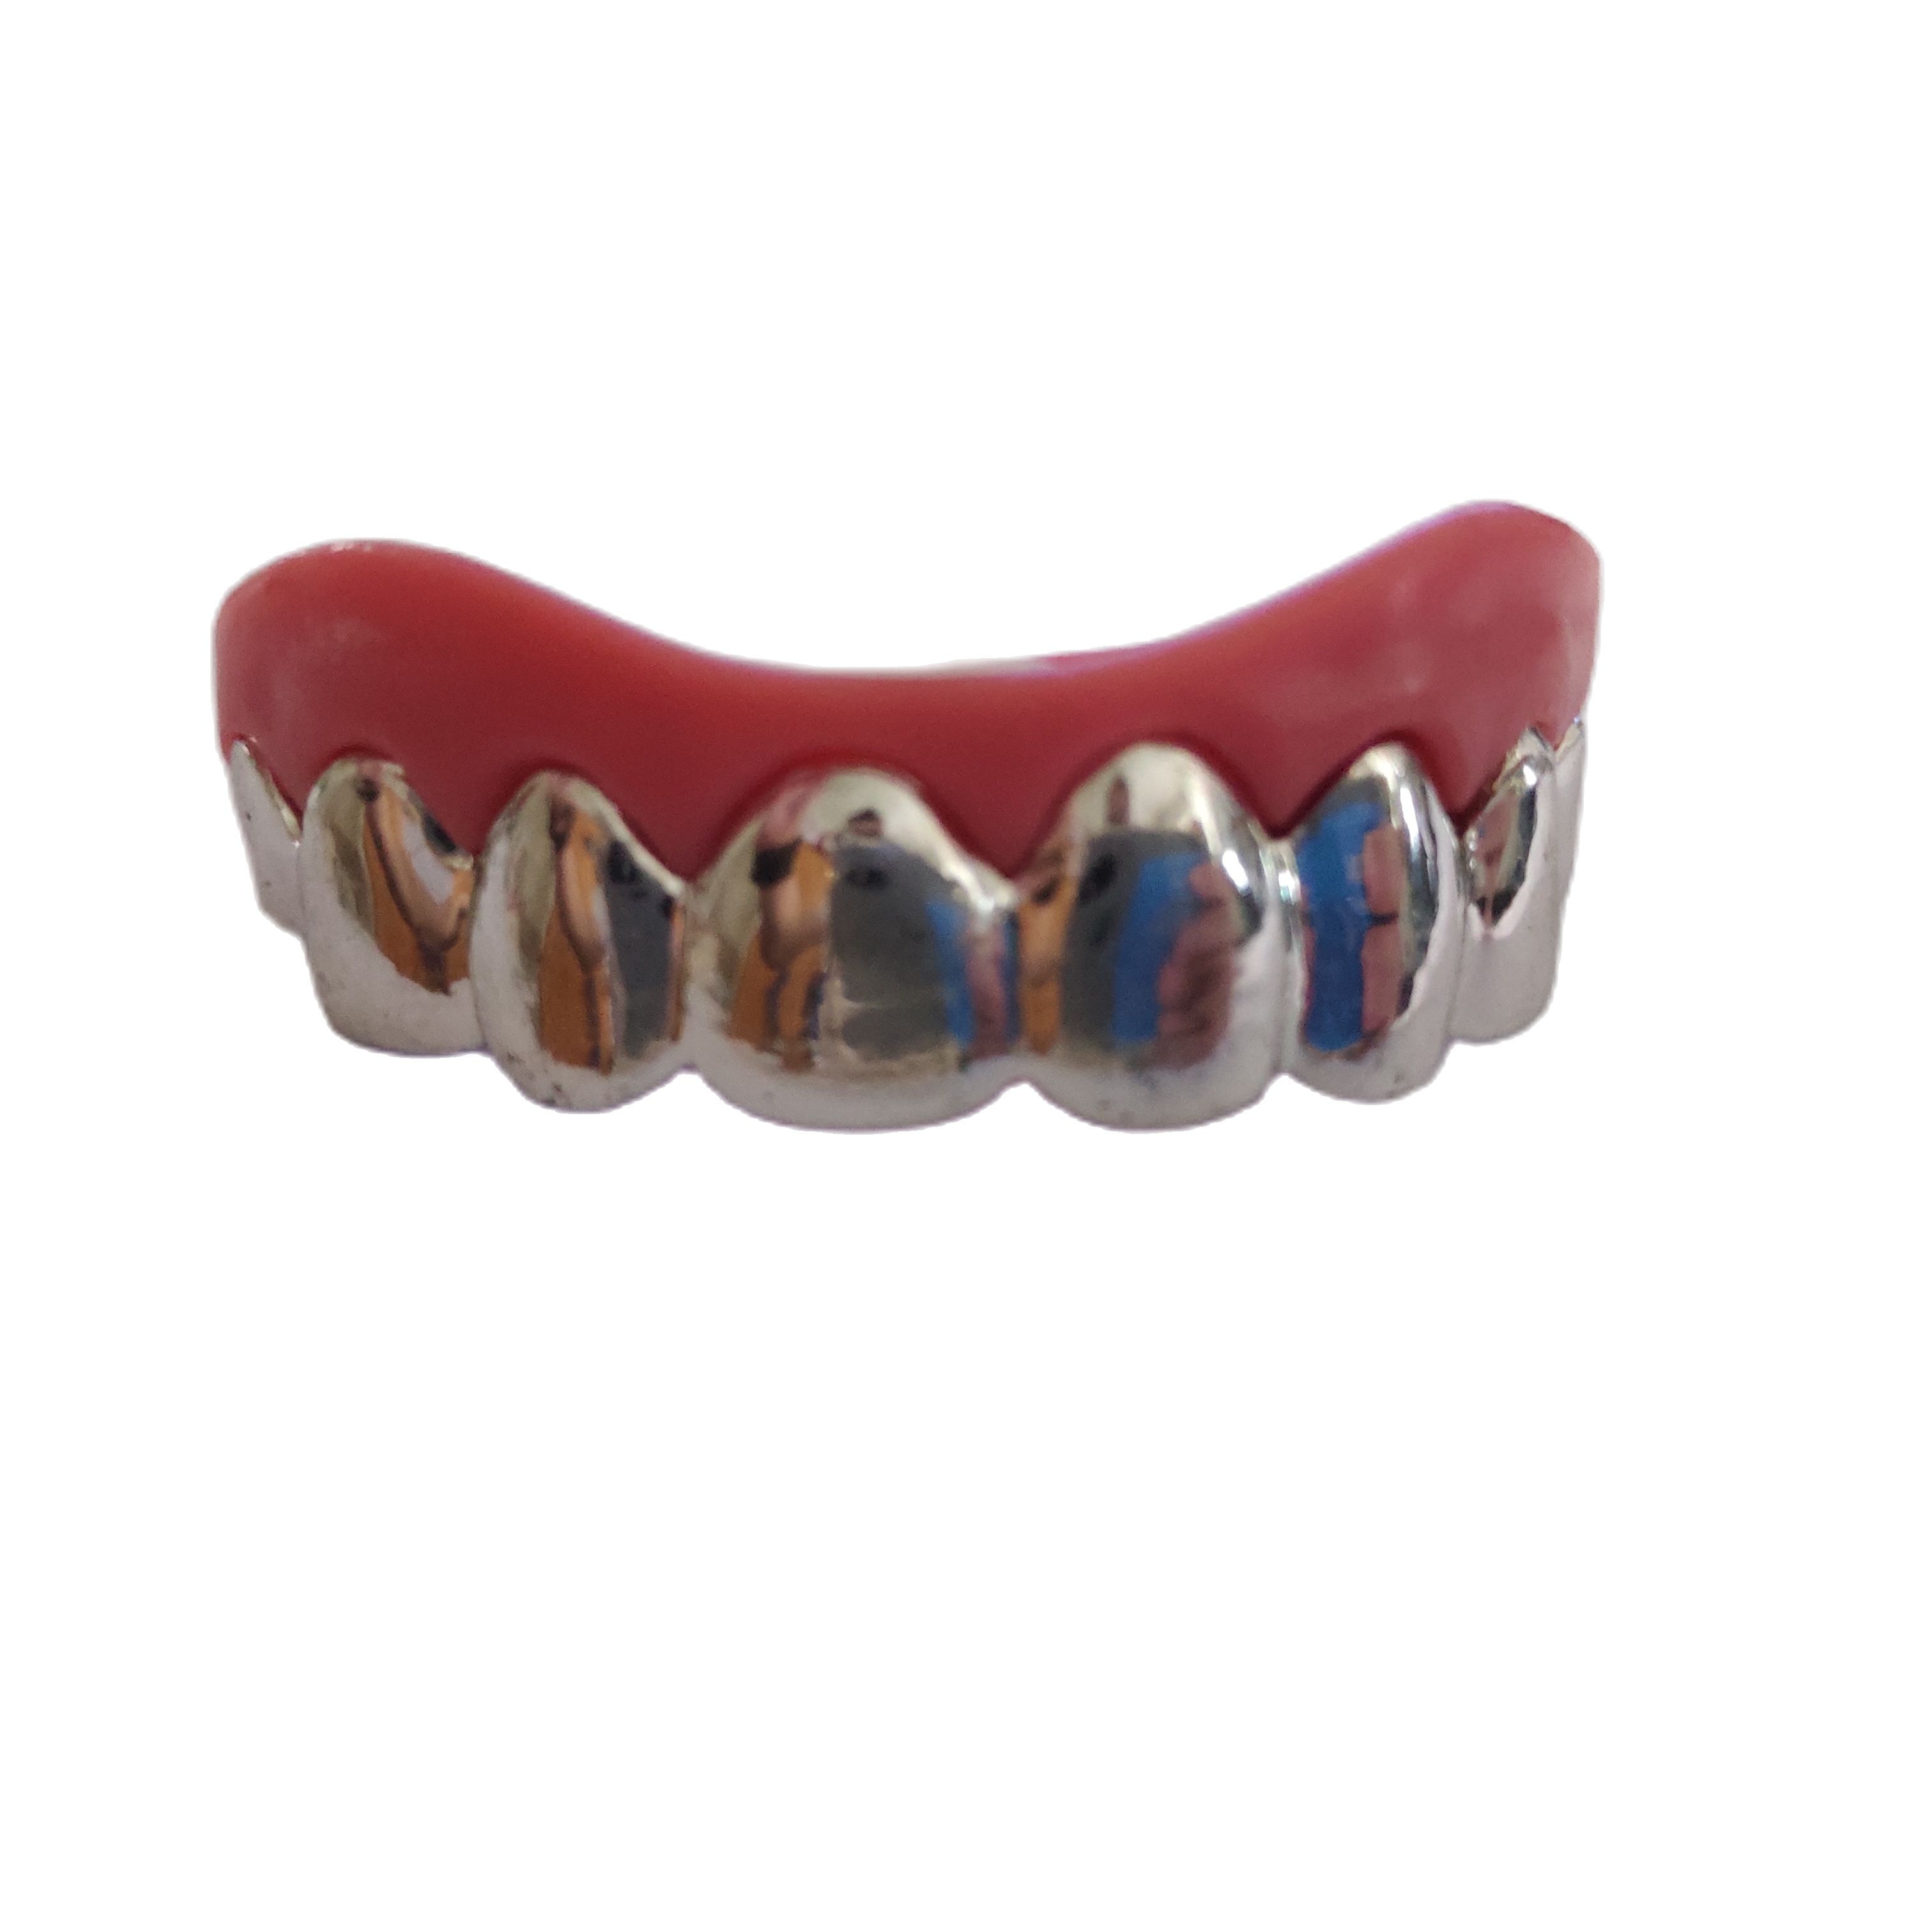 DIY Accessories Vampire Teeth Hip Hop Grillz  Fashion Body Jewelry Hip-hop Rapper Mouth Caps Custom Teeth Grills Tooth Grillz